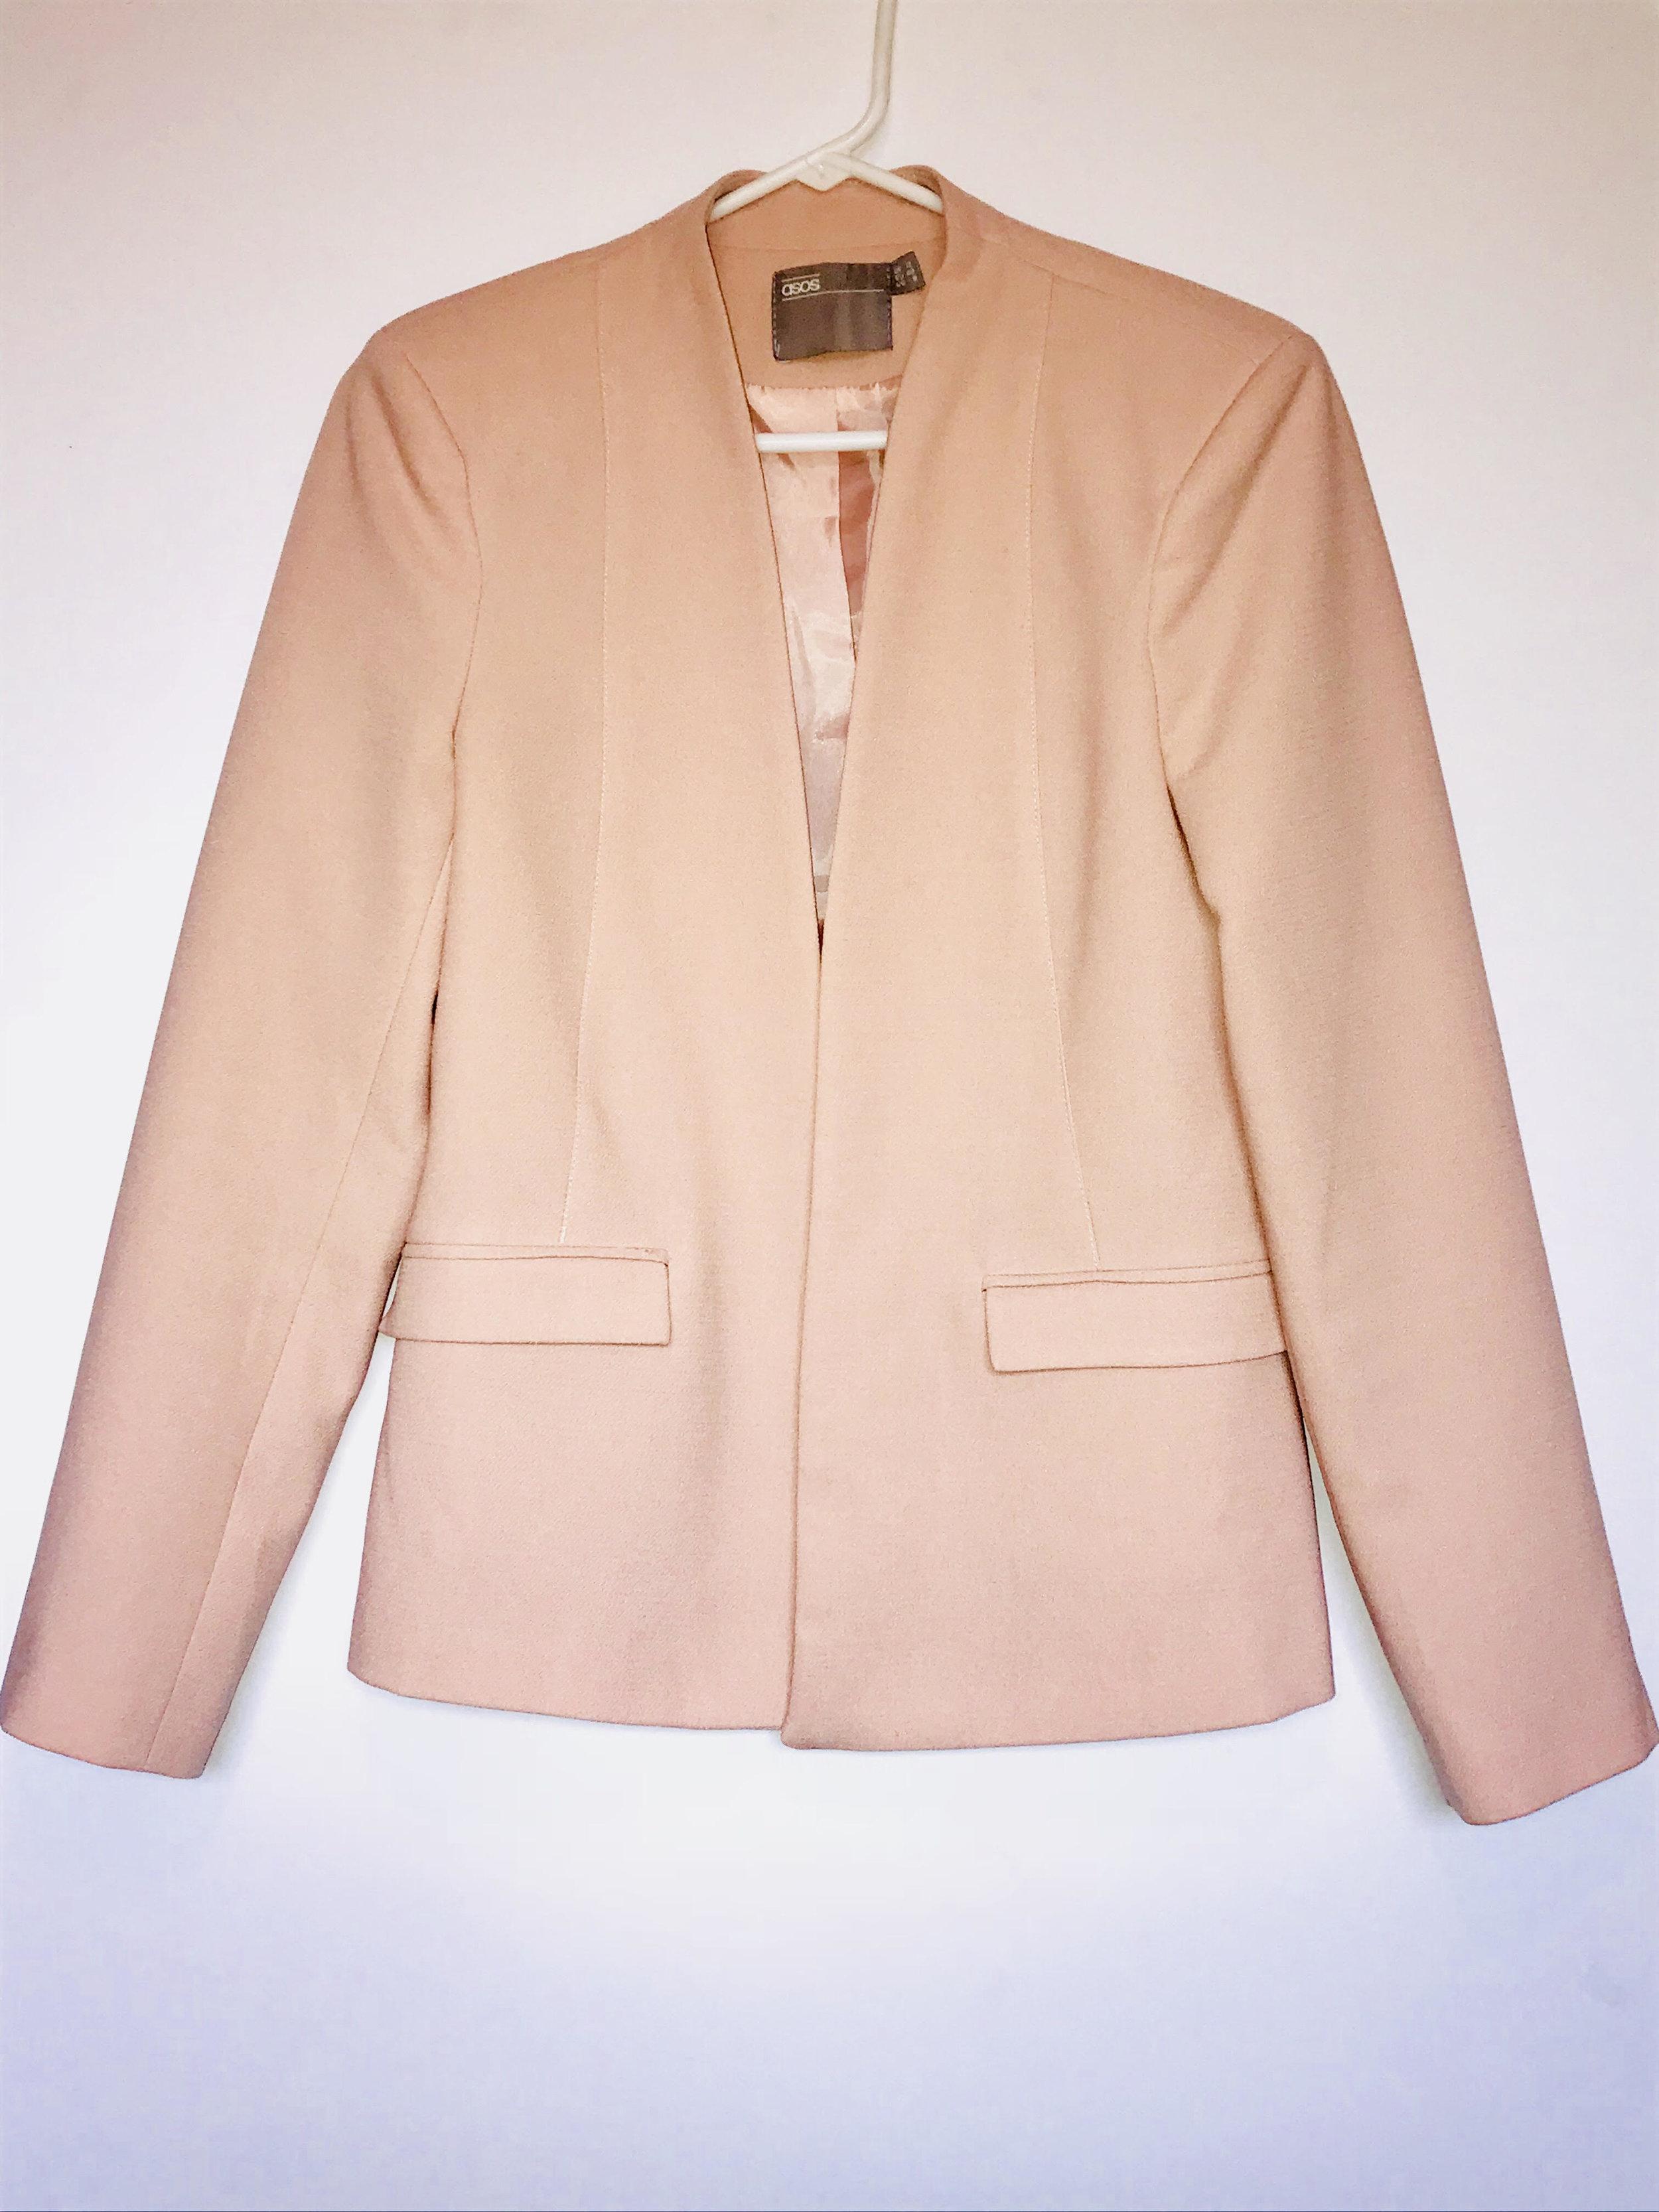 1. Pink Blazer - Price: $14Brand: ASOS